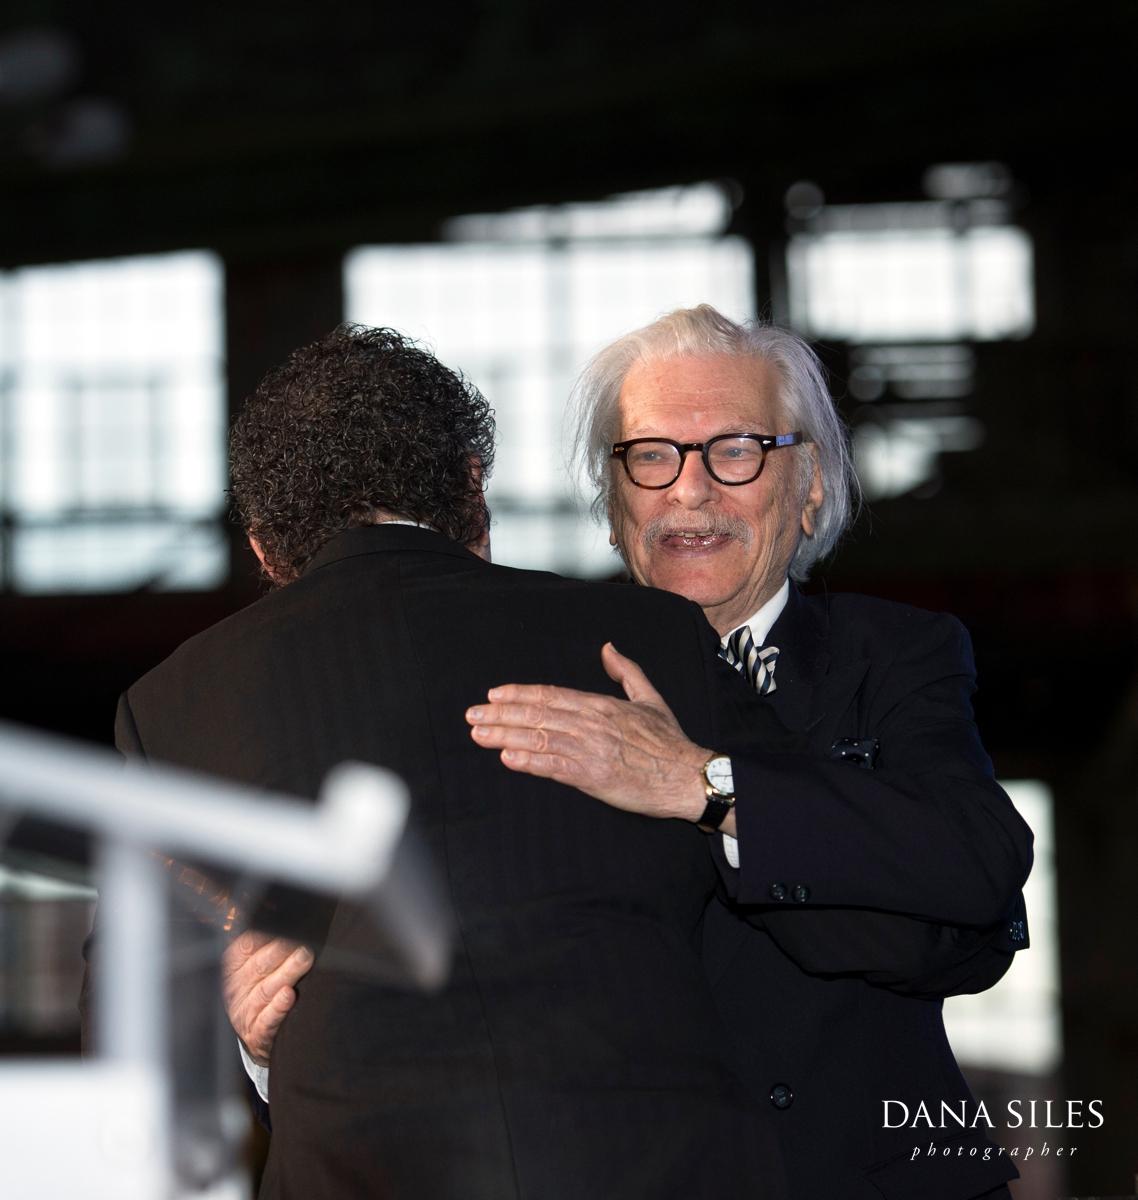 2018-Pell-Awards-gala-dana-siles-photographer-trinity-rep-18